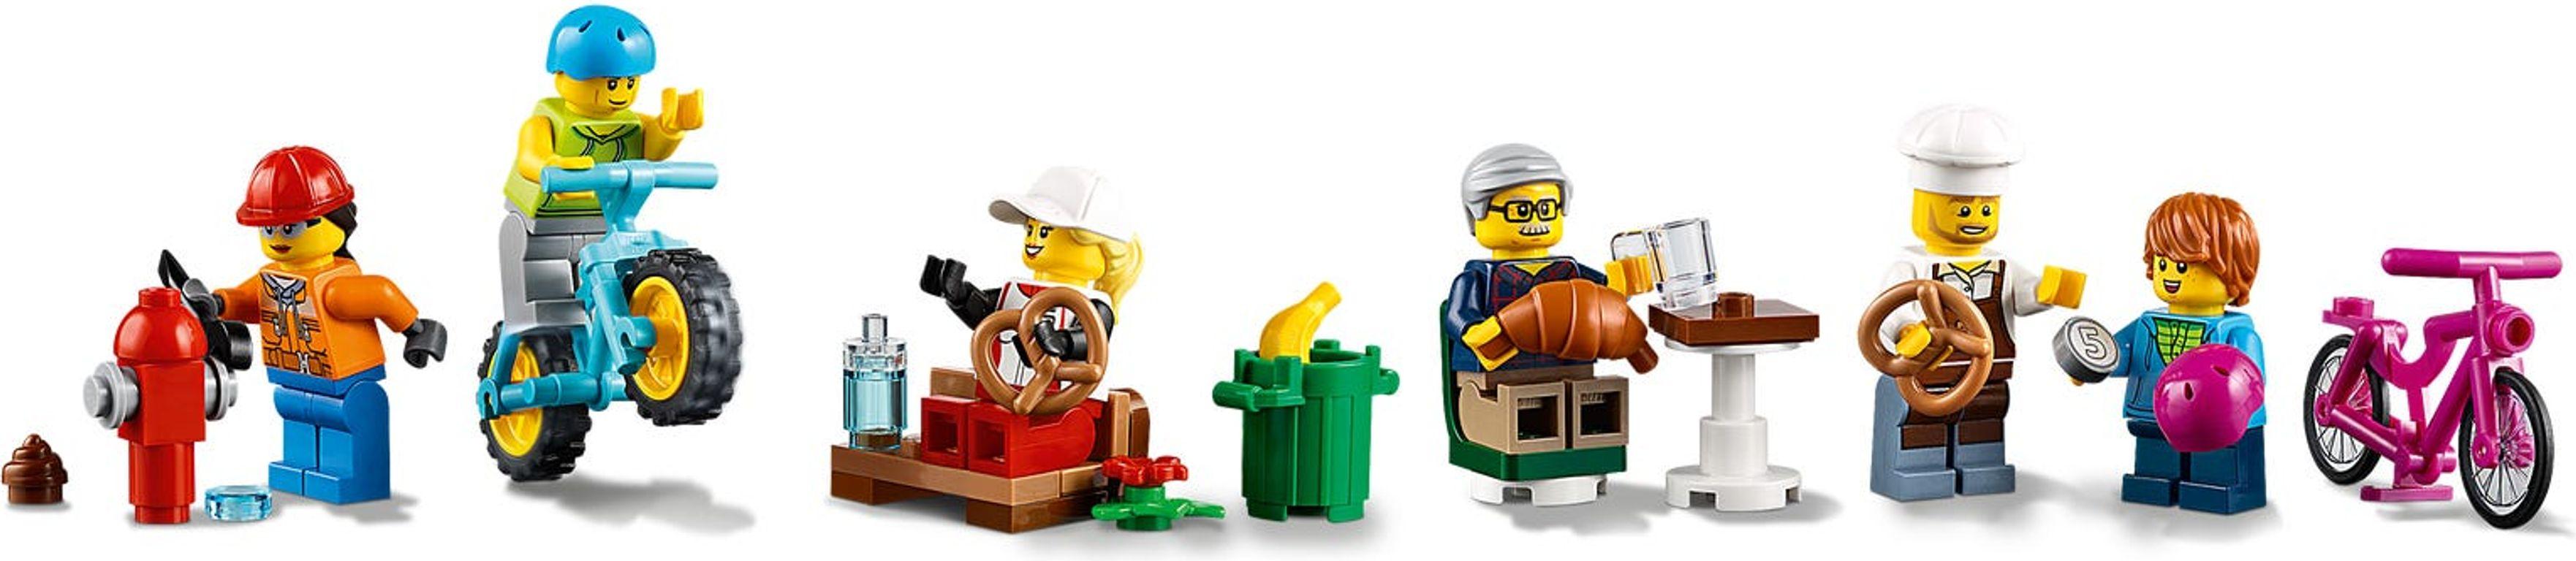 LEGO® City Shopping Street minifigures